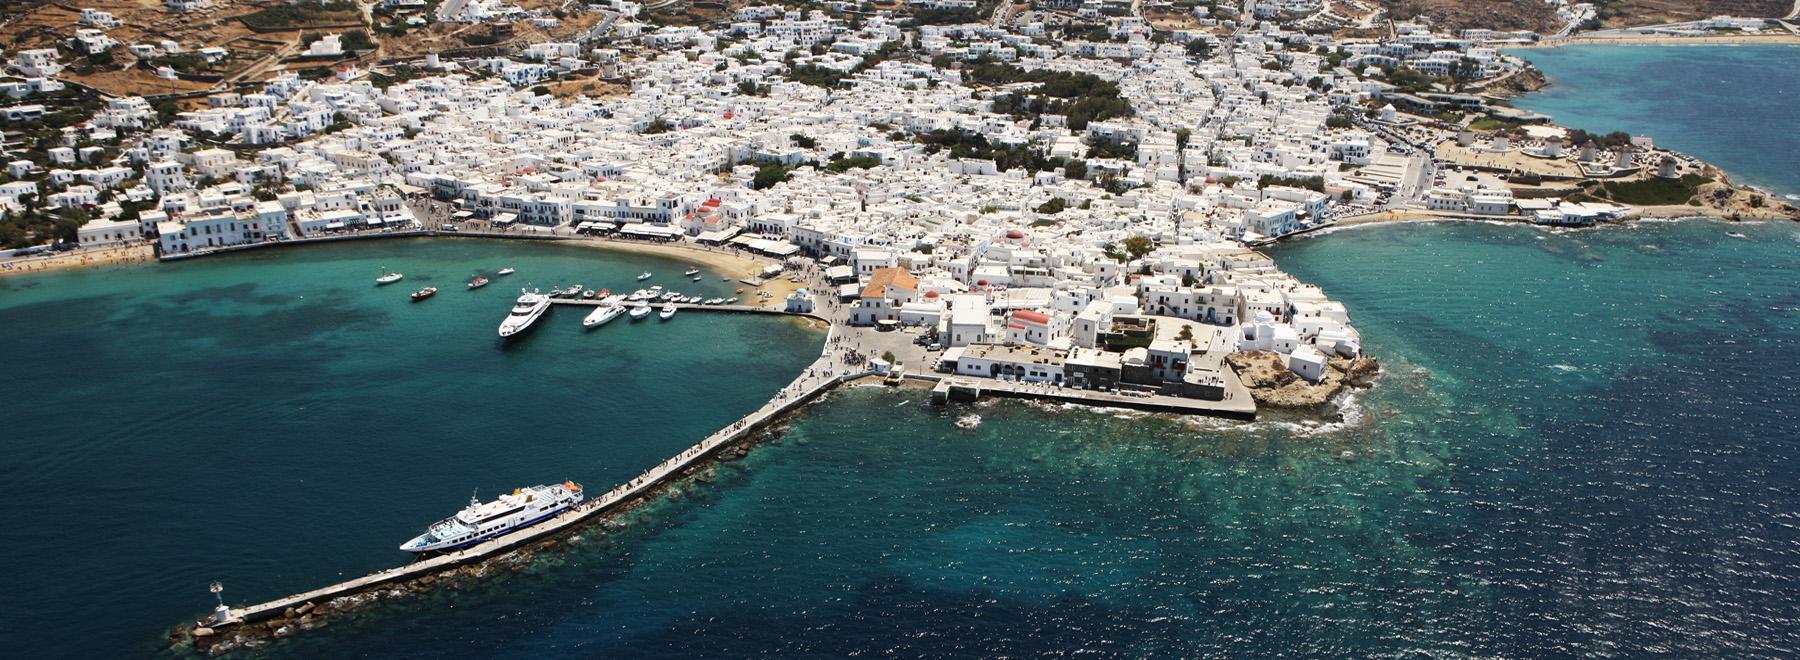 Mykonos Sightseeing Flights